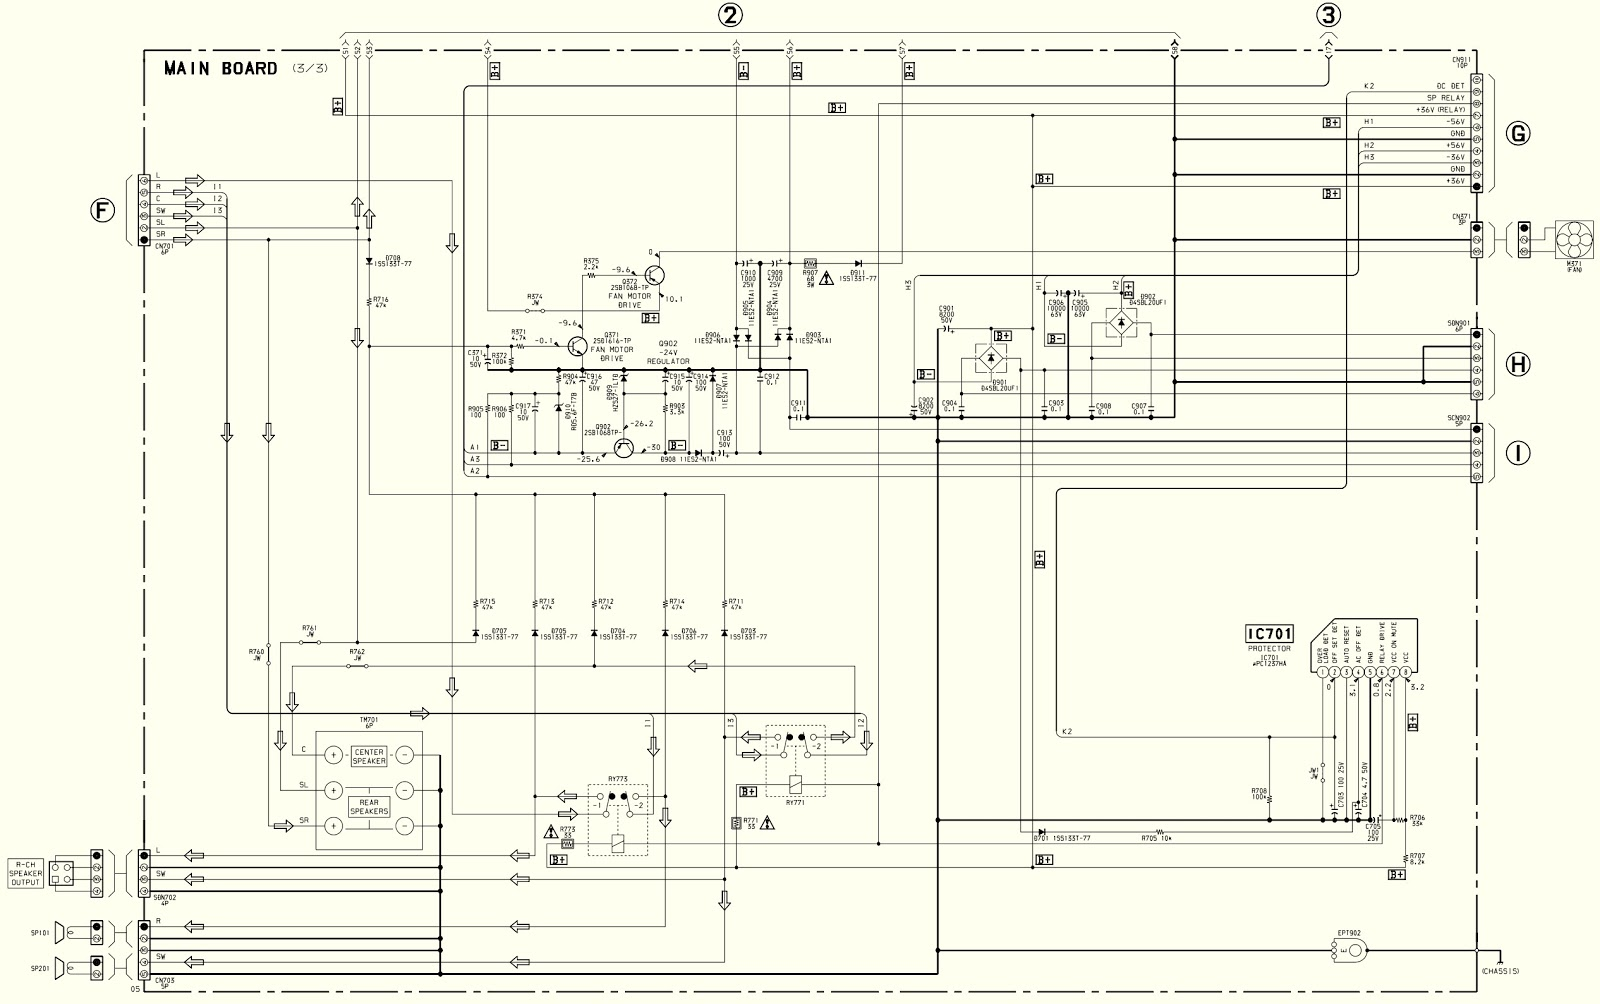 sony sava 500 test mode schematic diagram home theater speaker home speaker wiring diagram  [ 1600 x 1004 Pixel ]